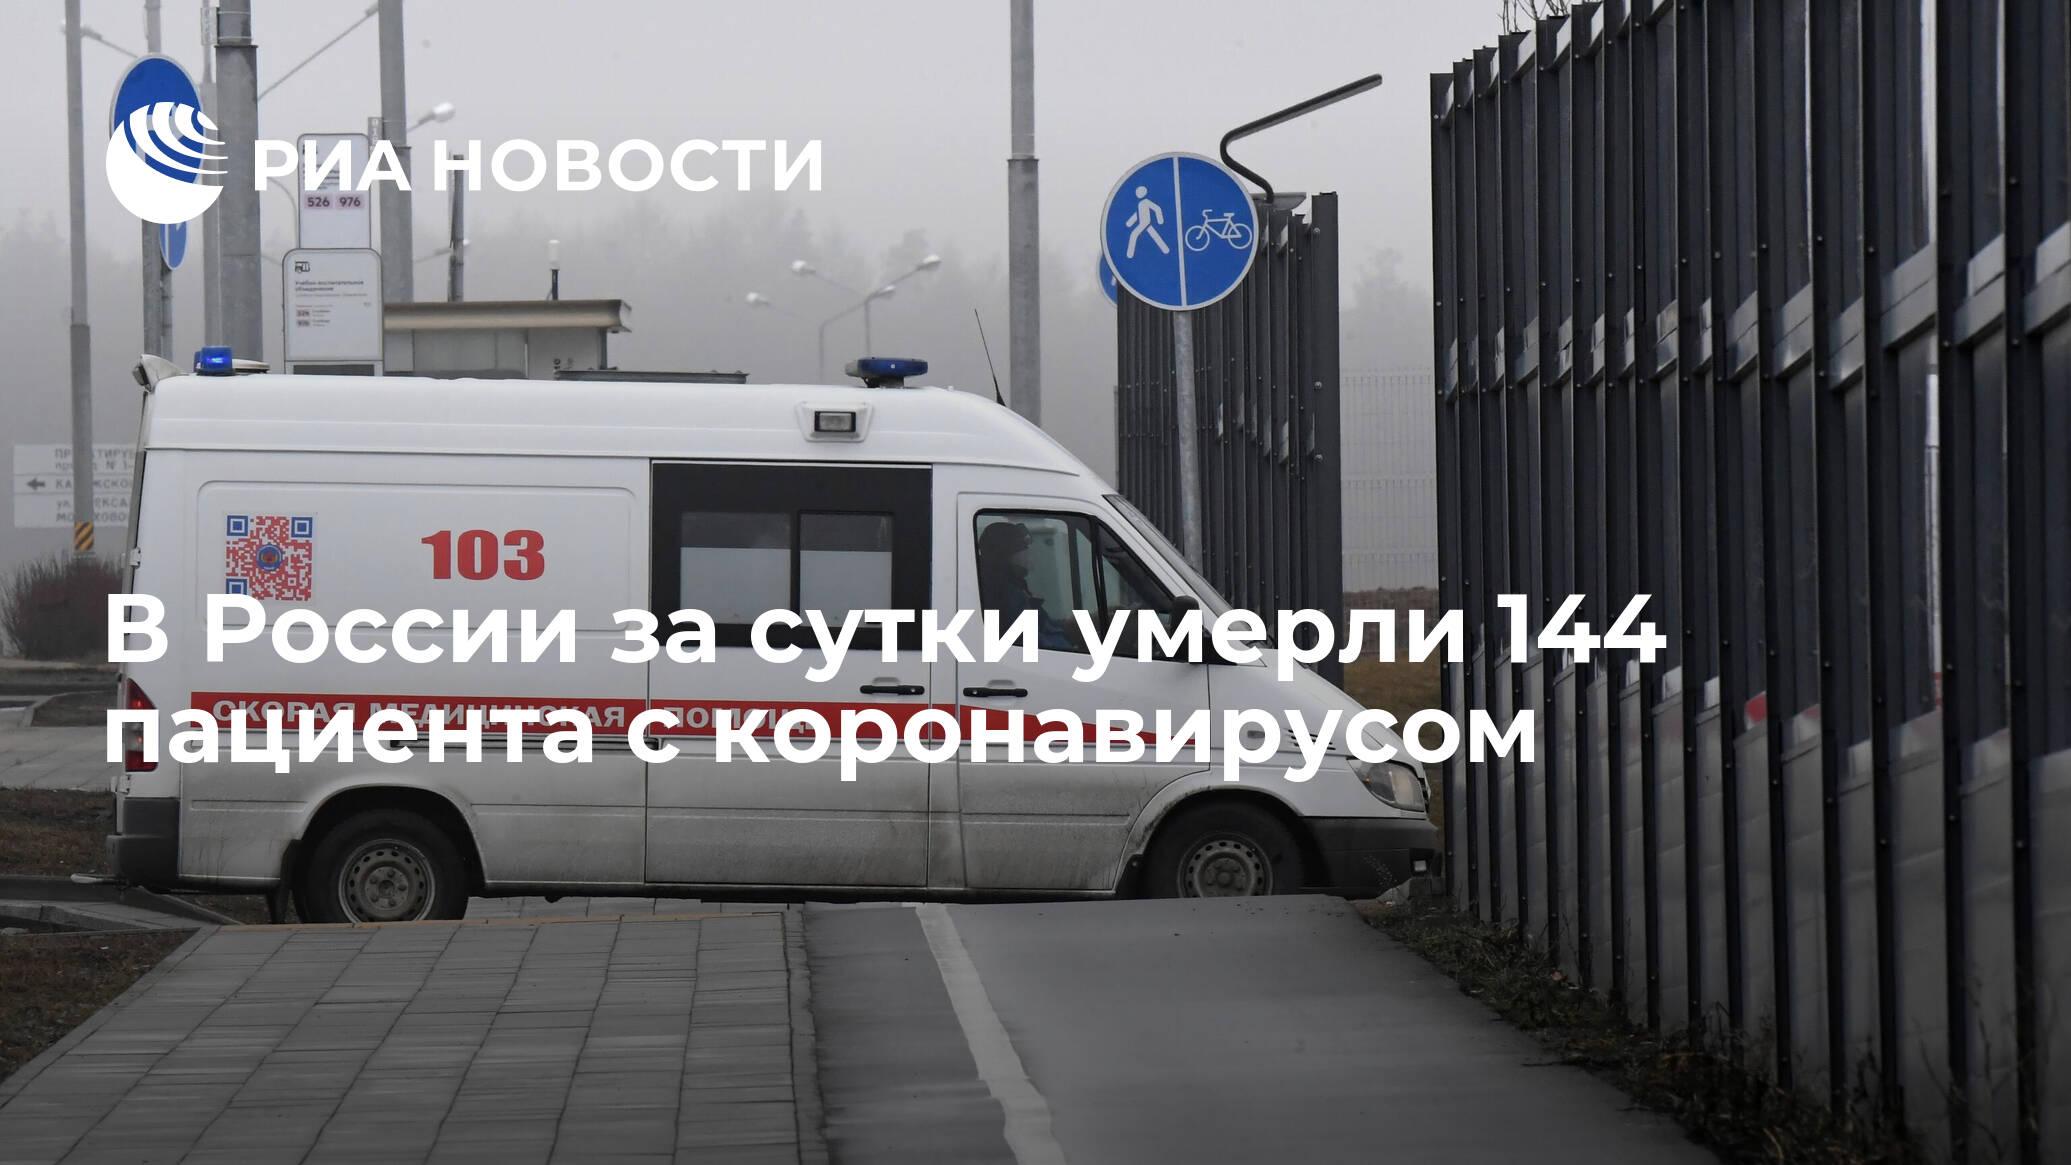 В России за сутки умерли 144 пациента с коронавирусом